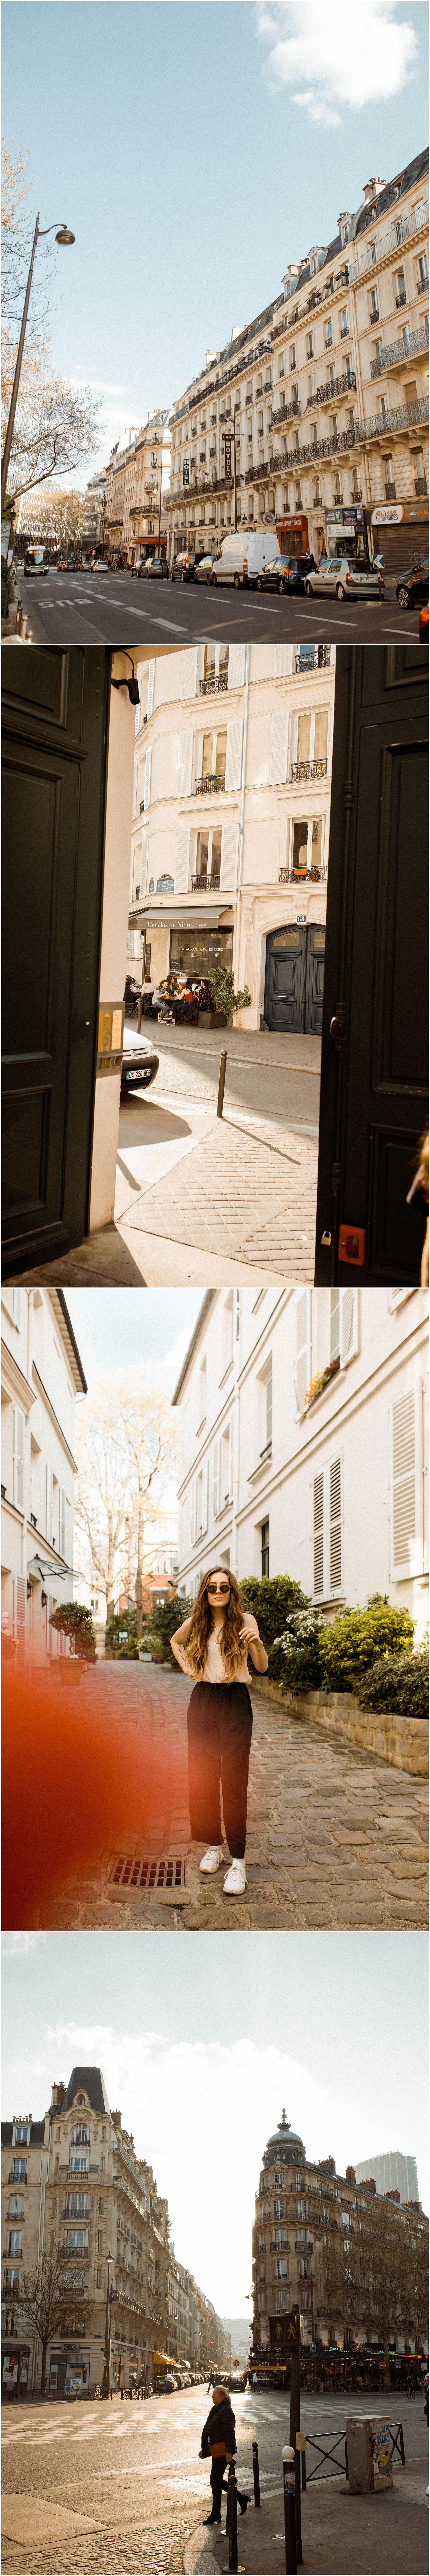 samlandreth-paris-france-neighborhoods-to-walk-around-in